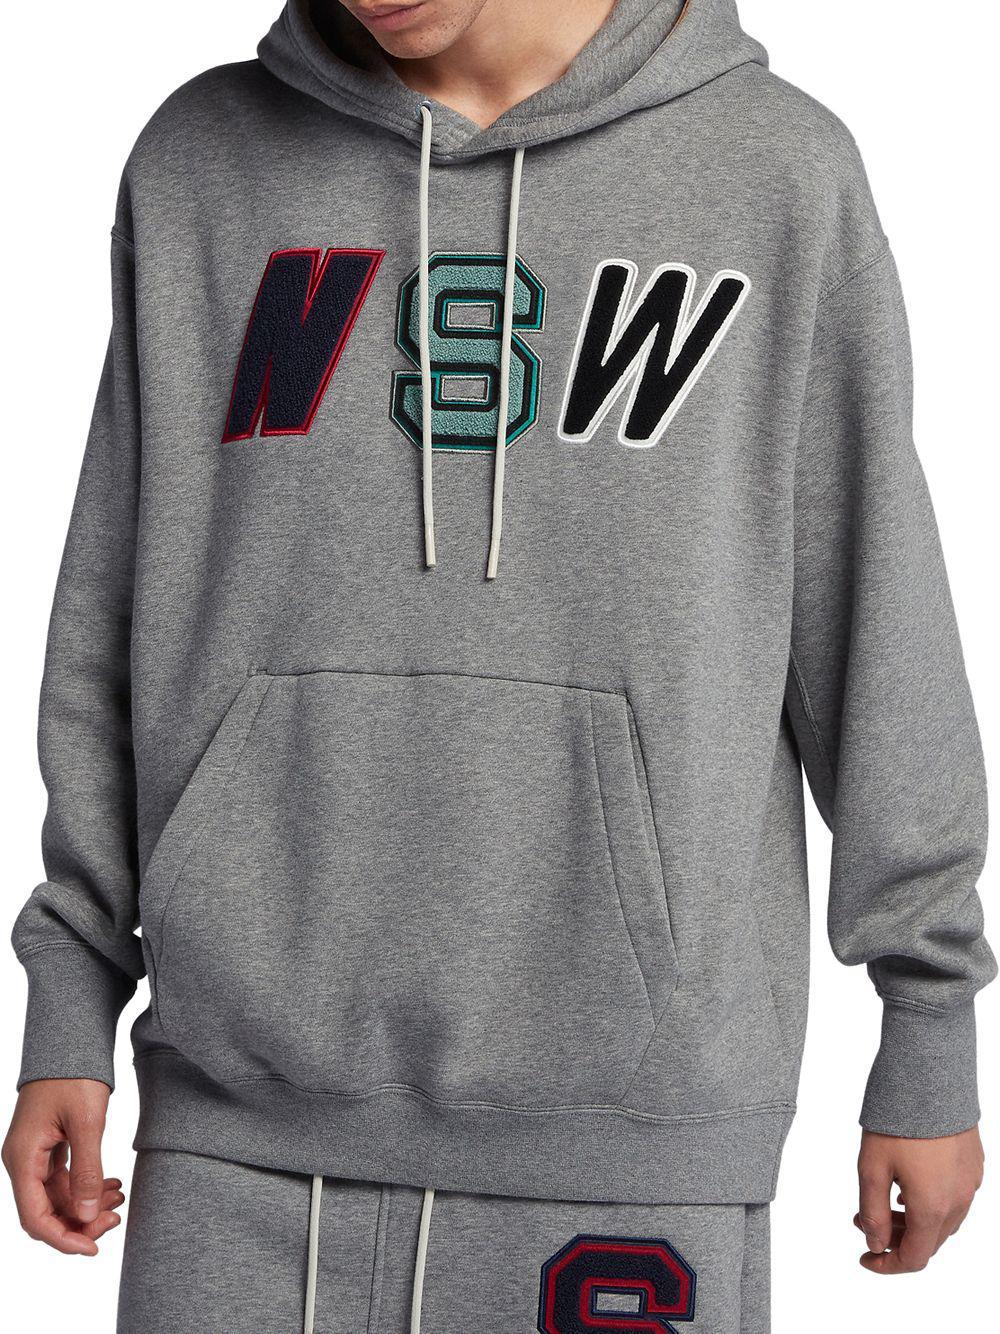 409330a22b4b Lyst - Nike Nsw Pocket Hoodie in Gray for Men